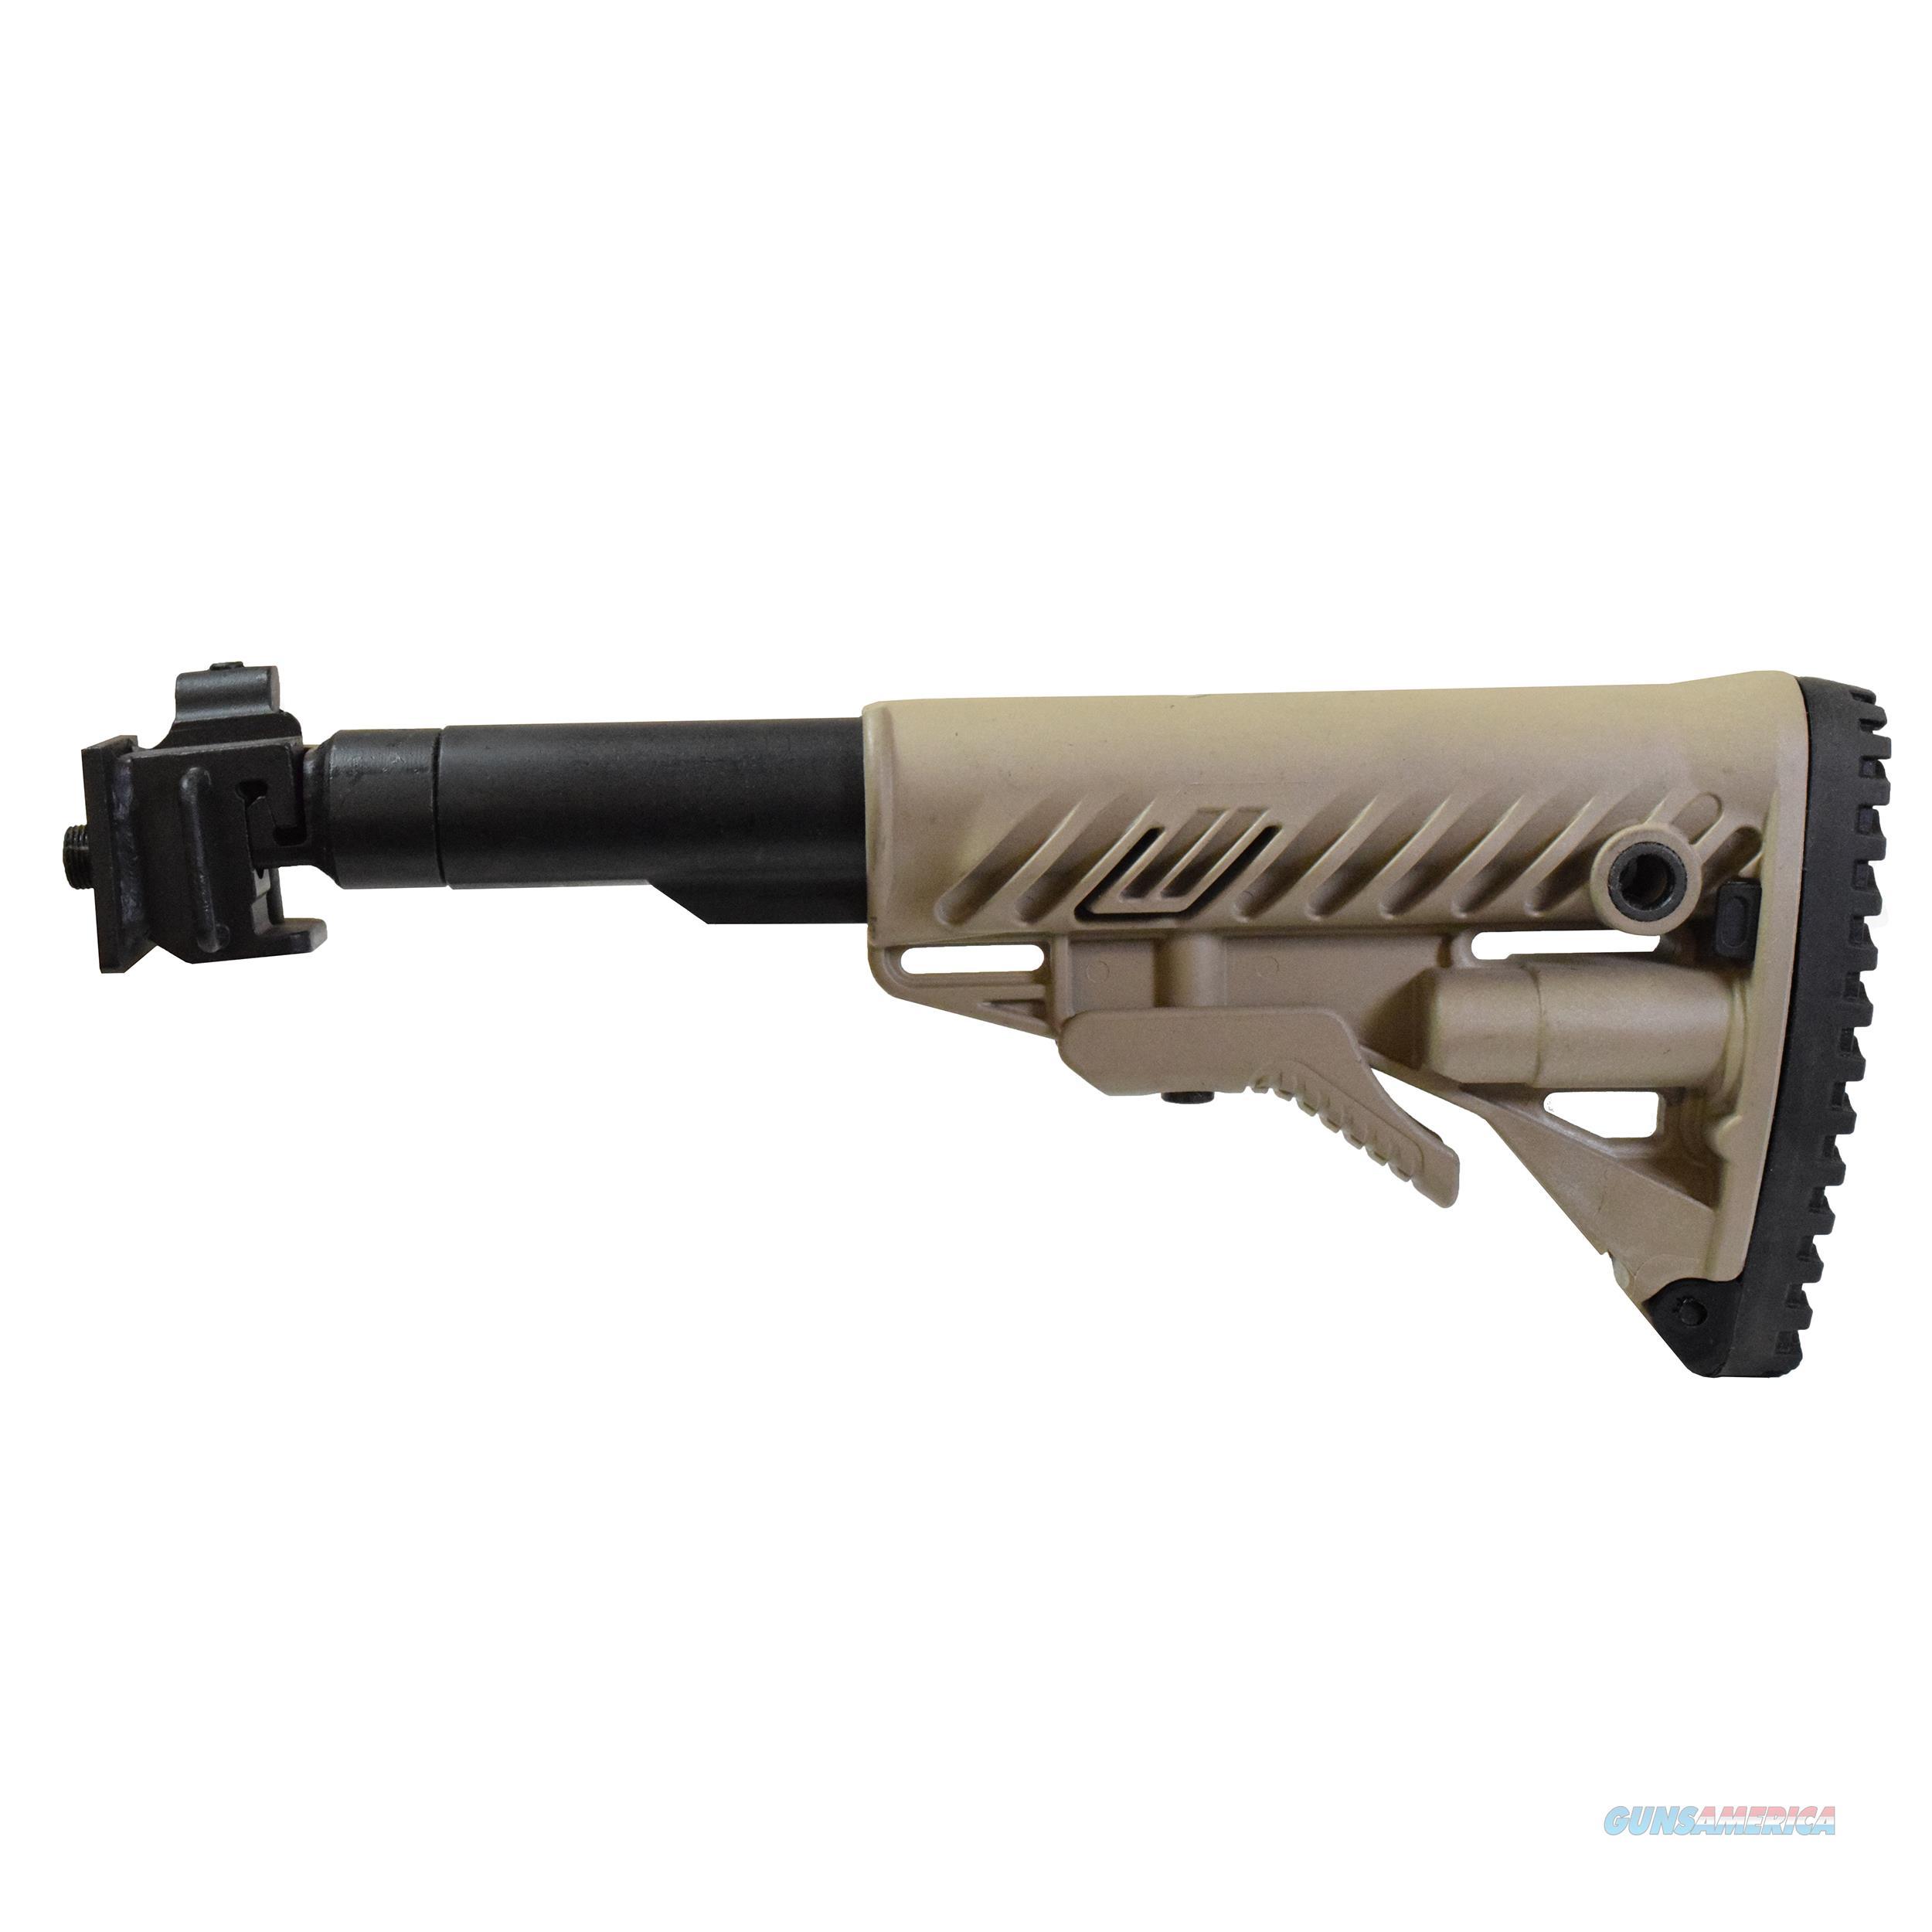 Mako Group Galil Style Folding Collapsible Buttstock System M4VZ-FDE  Non-Guns > Gunstocks, Grips & Wood